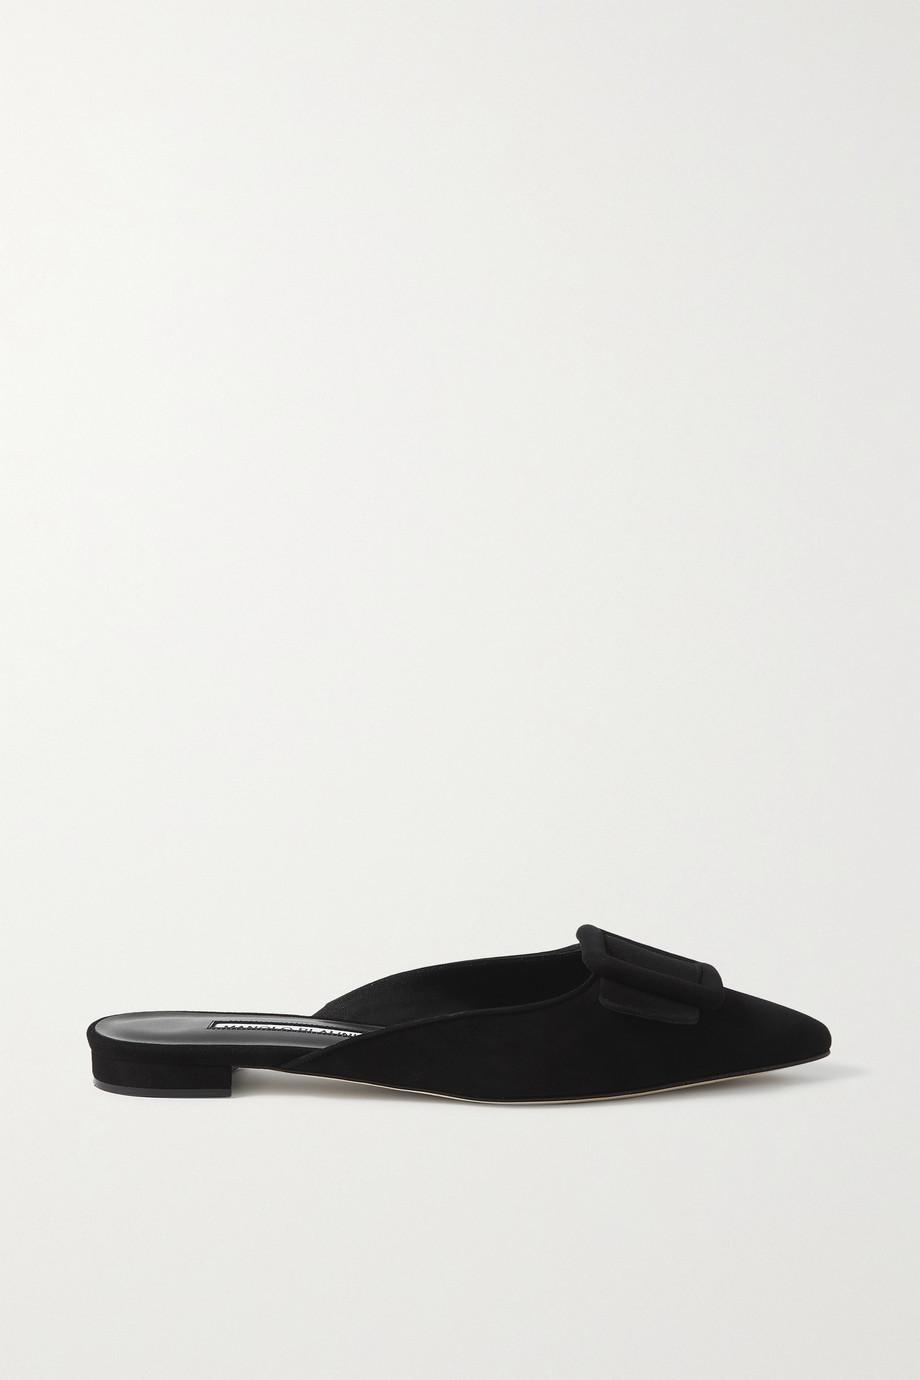 Manolo Blahnik Maysale buckled suede point-toe flats